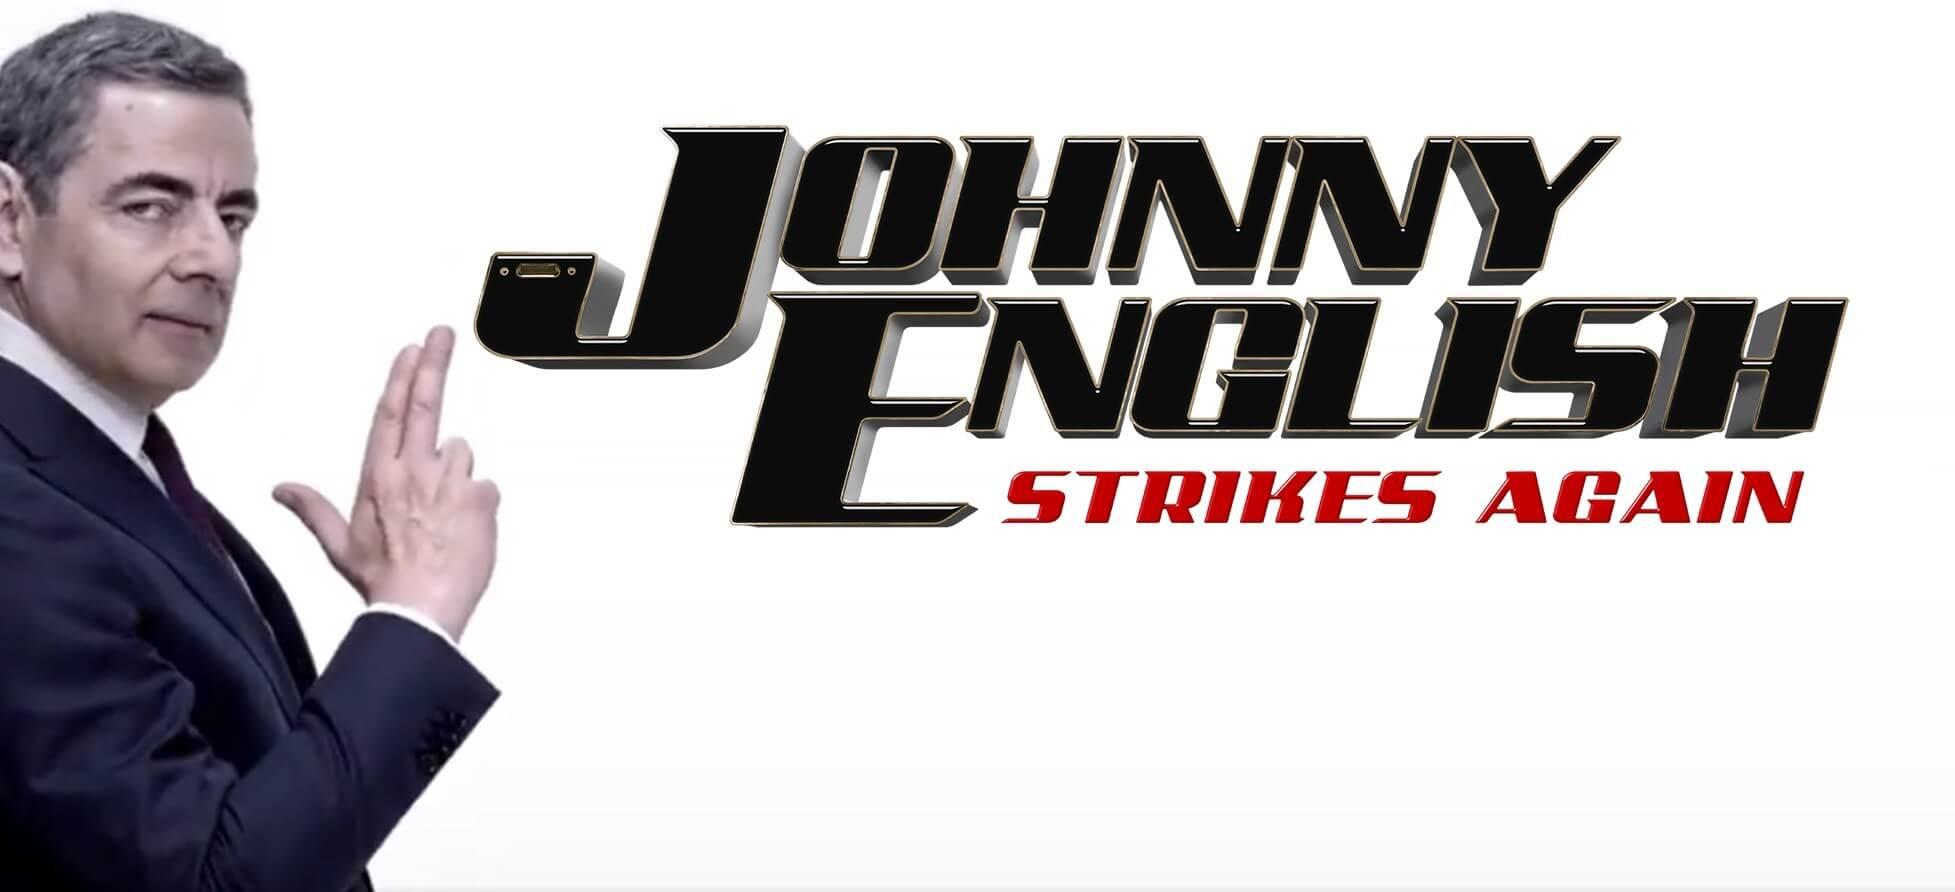 Aksi Agen Rahasia Rowan Atkinson Dalam JOHNNY ENGLISH STRIKES AGAIN Segera Rilis